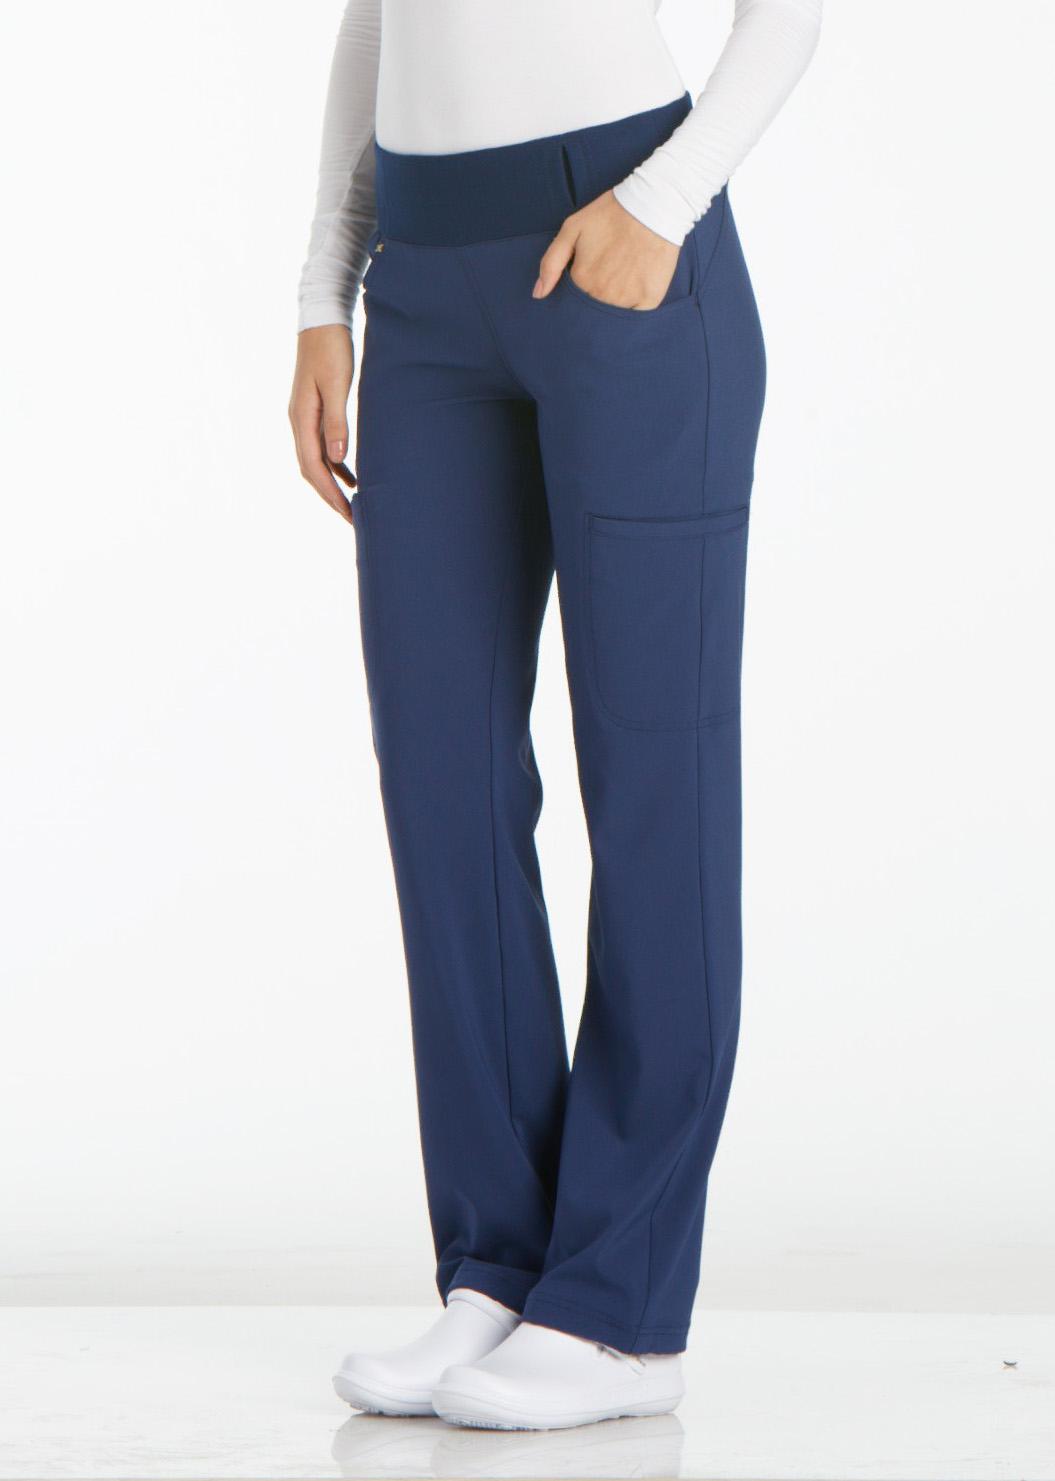 Cherokee iflex Mid Rise Straight Leg Pull-on Pant-NEW-FREE SHIP